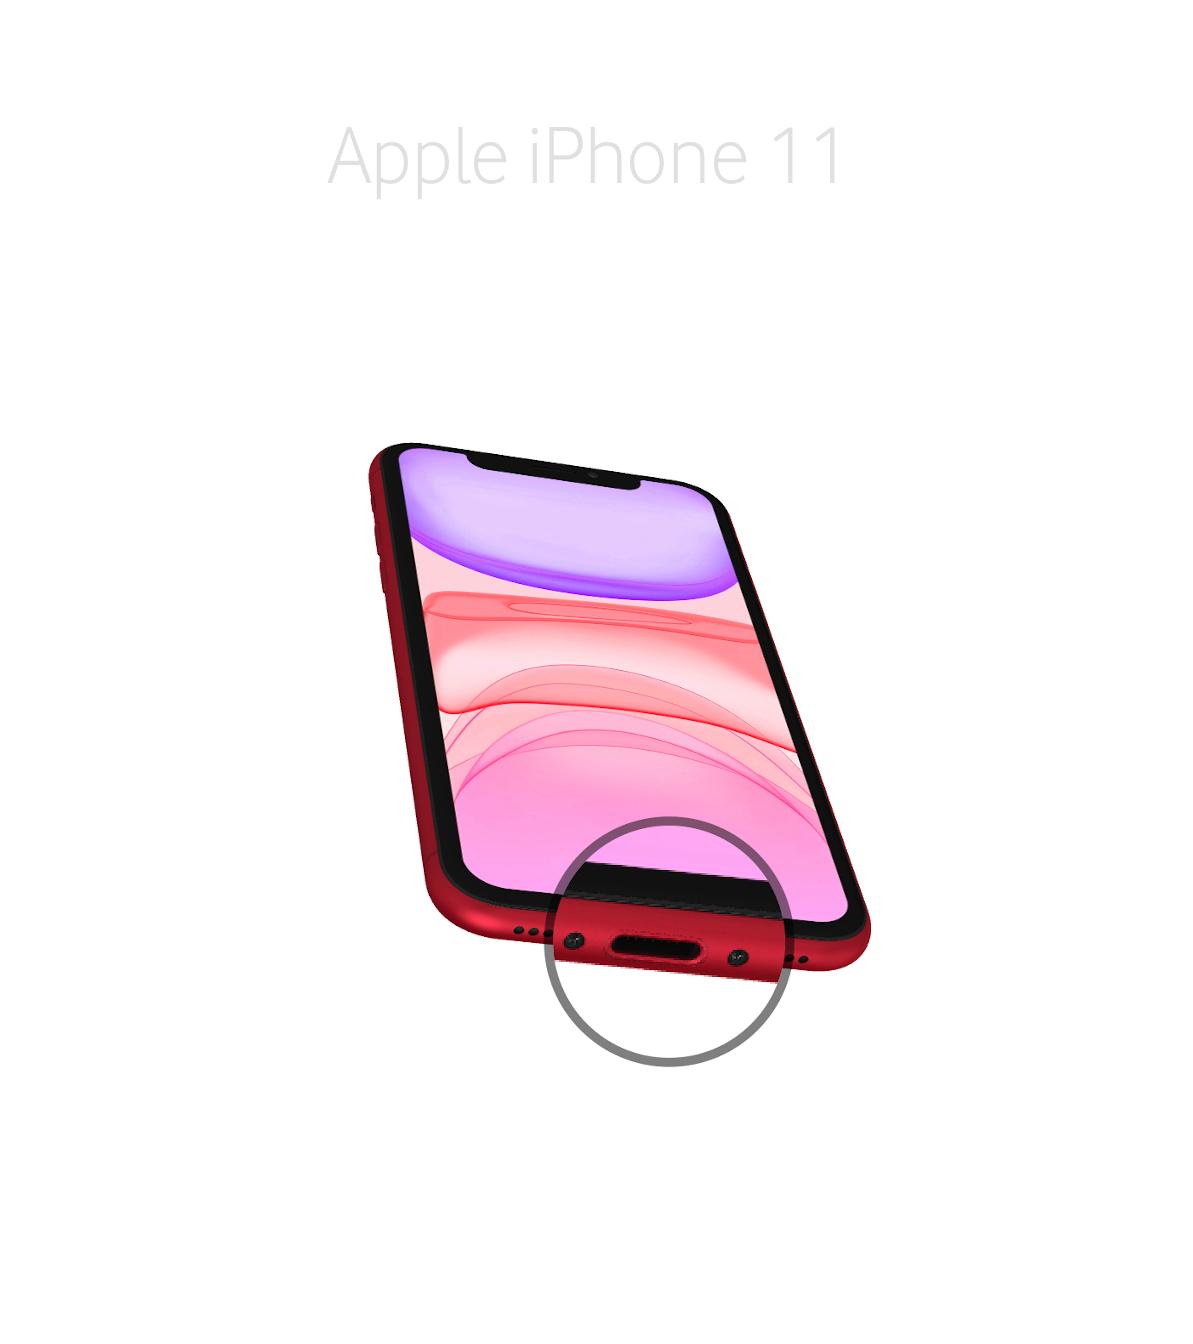 Laga lightningkontakt iPhone 11